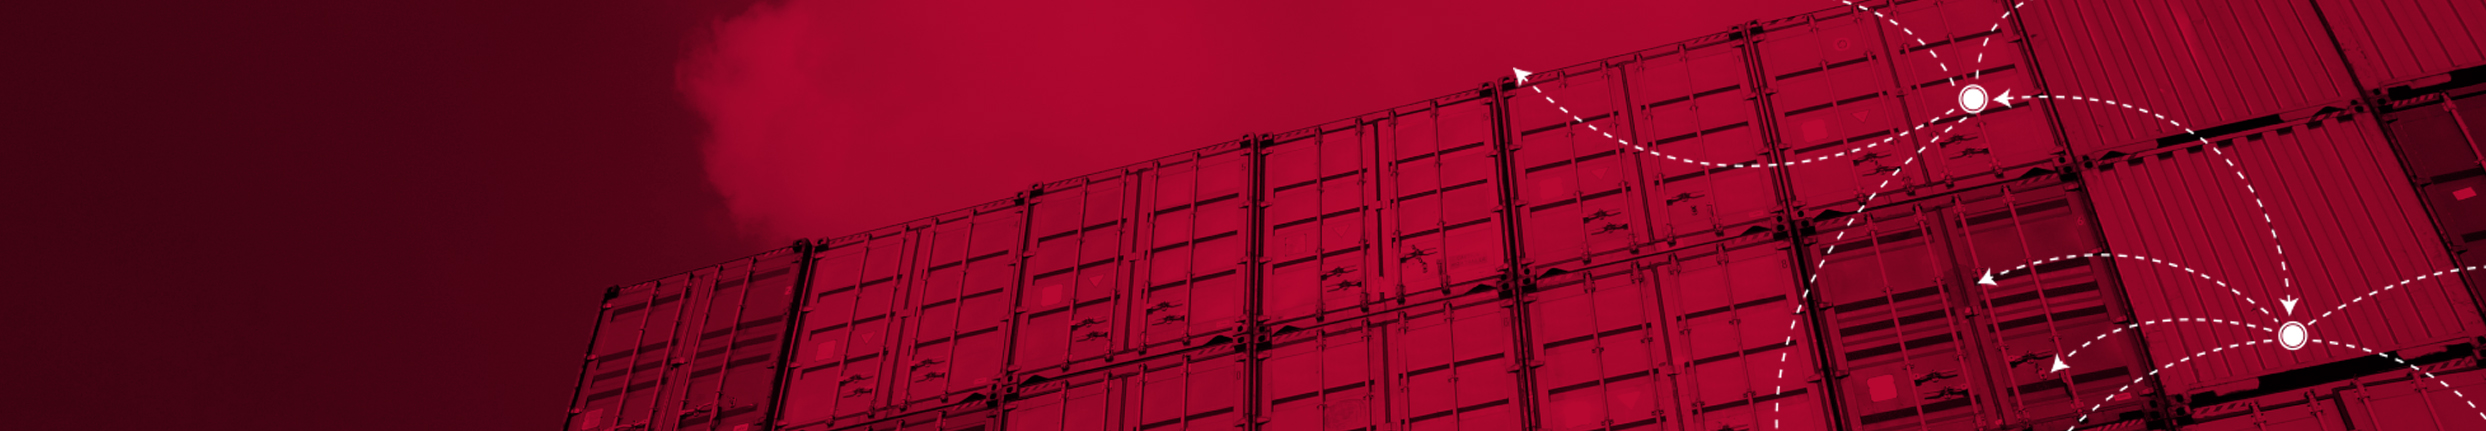 Cargo_web_banner